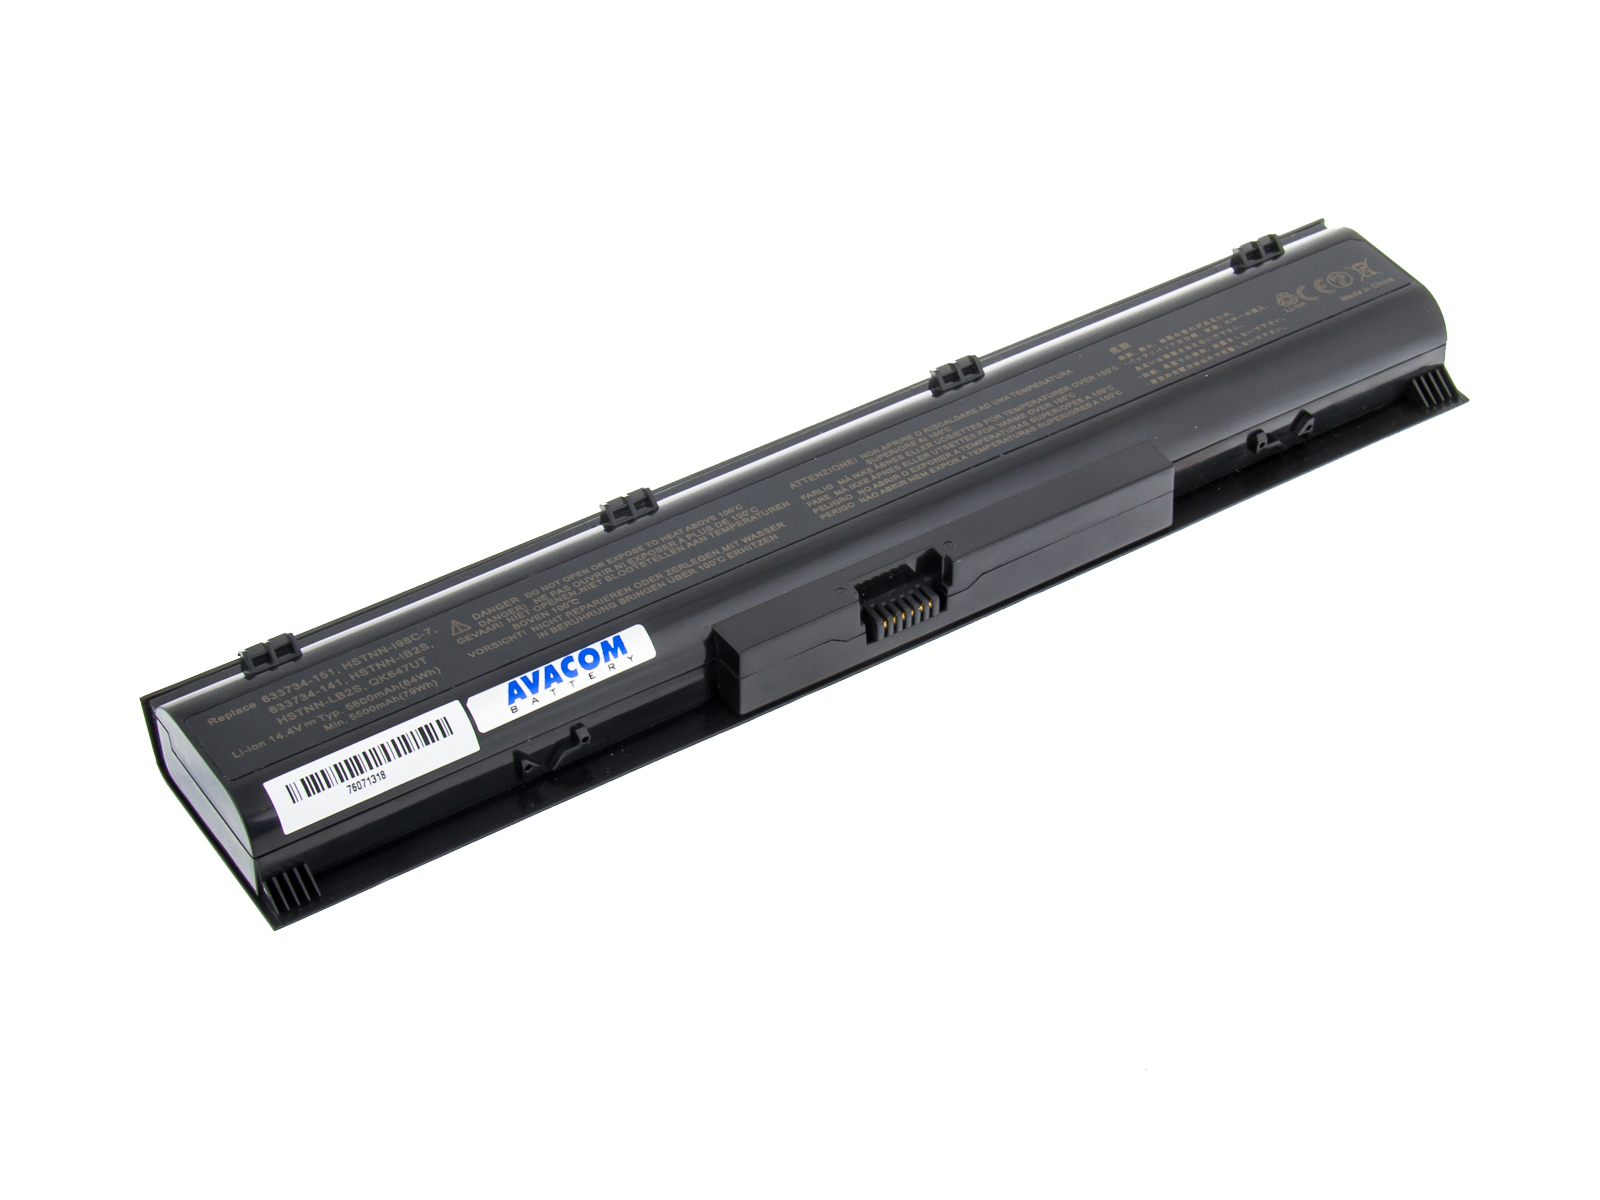 Baterie AVACOM NOHP-PB47-P29 pro HP ProBook 4730s Li-Ion 14,4V 5800mAh